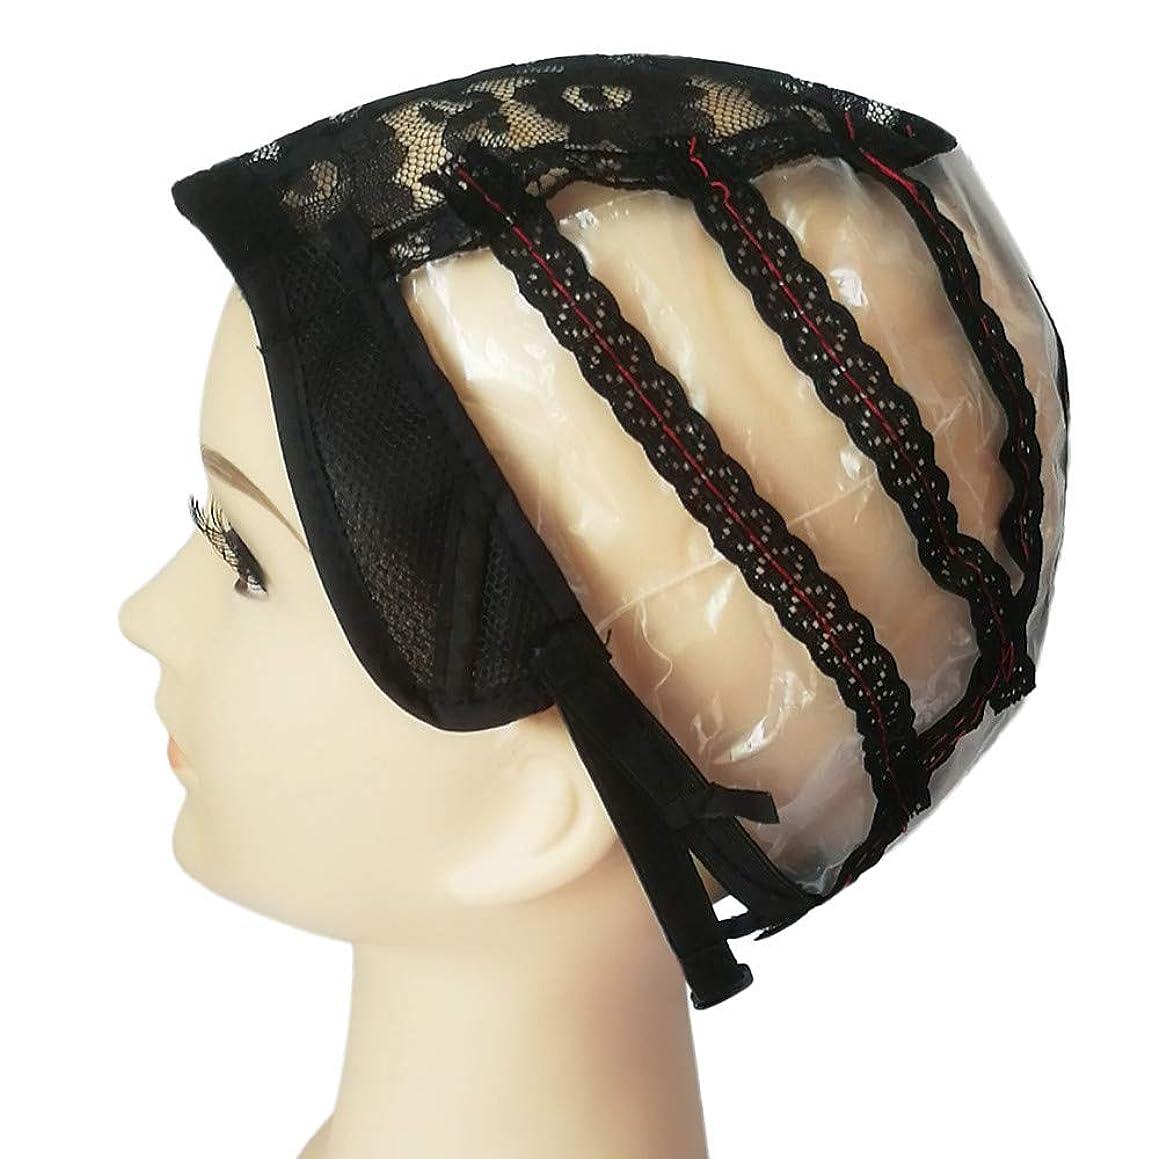 Weaving Full Lace Wig Cap for Making Wigs, Iuhan Wig Cap Making Elastic Breathable Lace Mesh Net Weaving Cap Adjustable Head (Black)